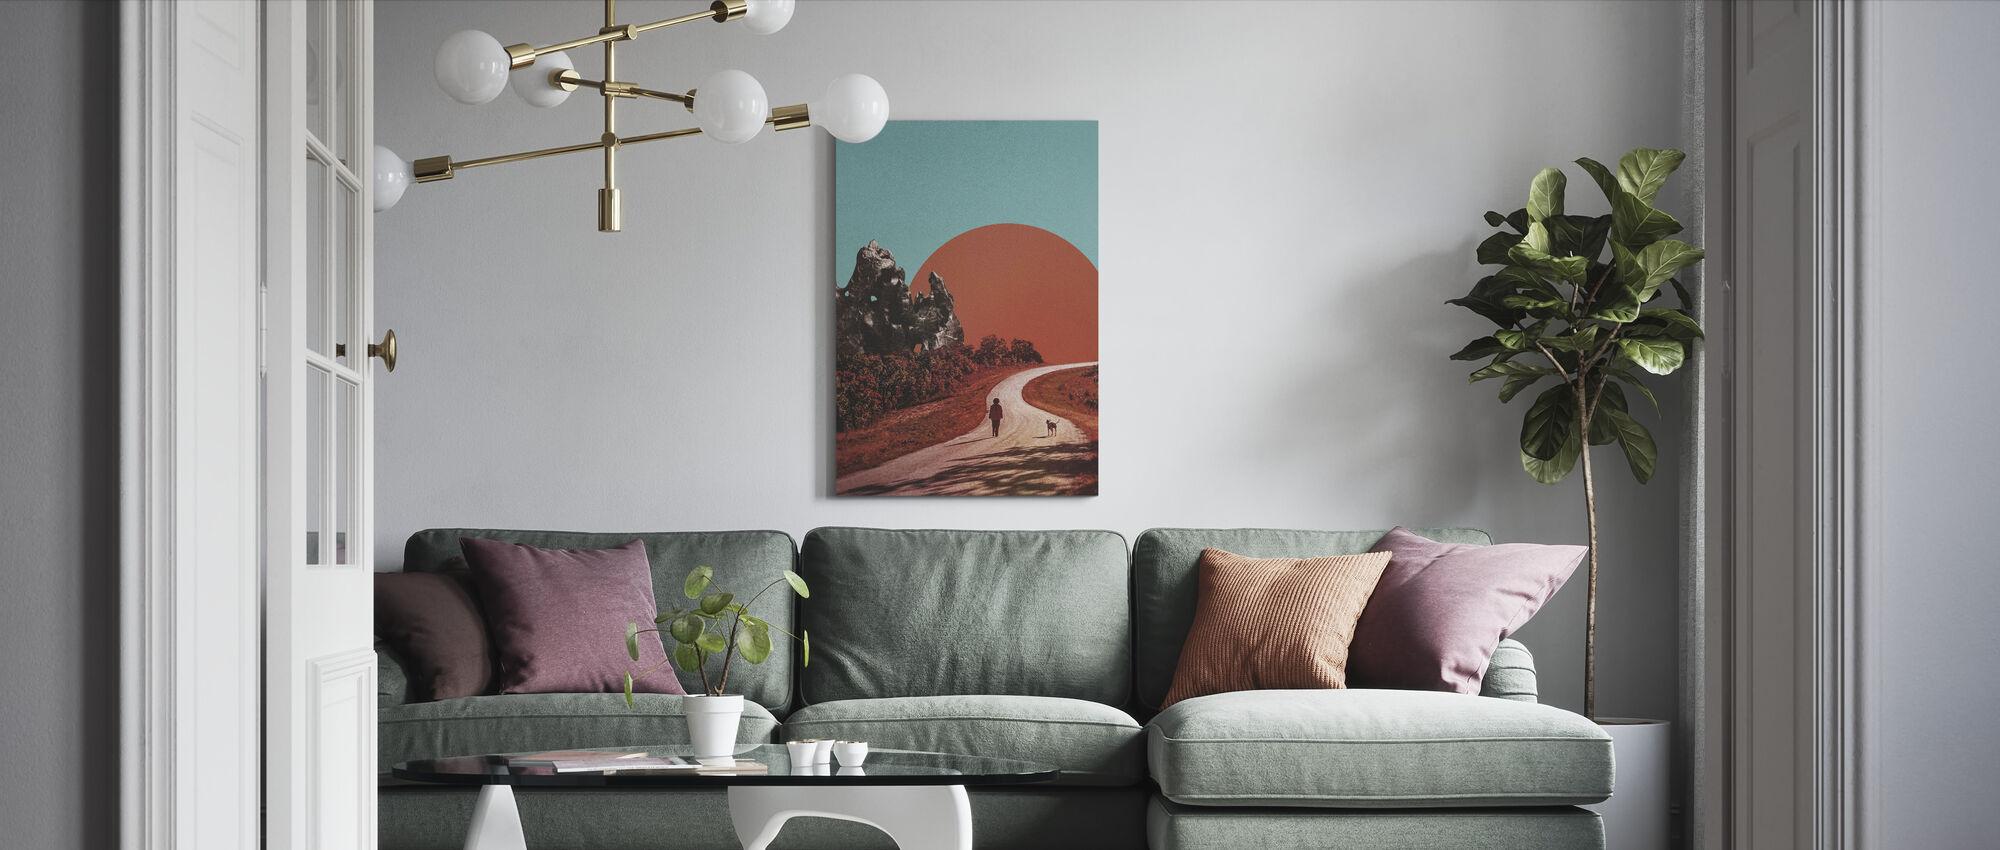 Walk - Canvas print - Living Room